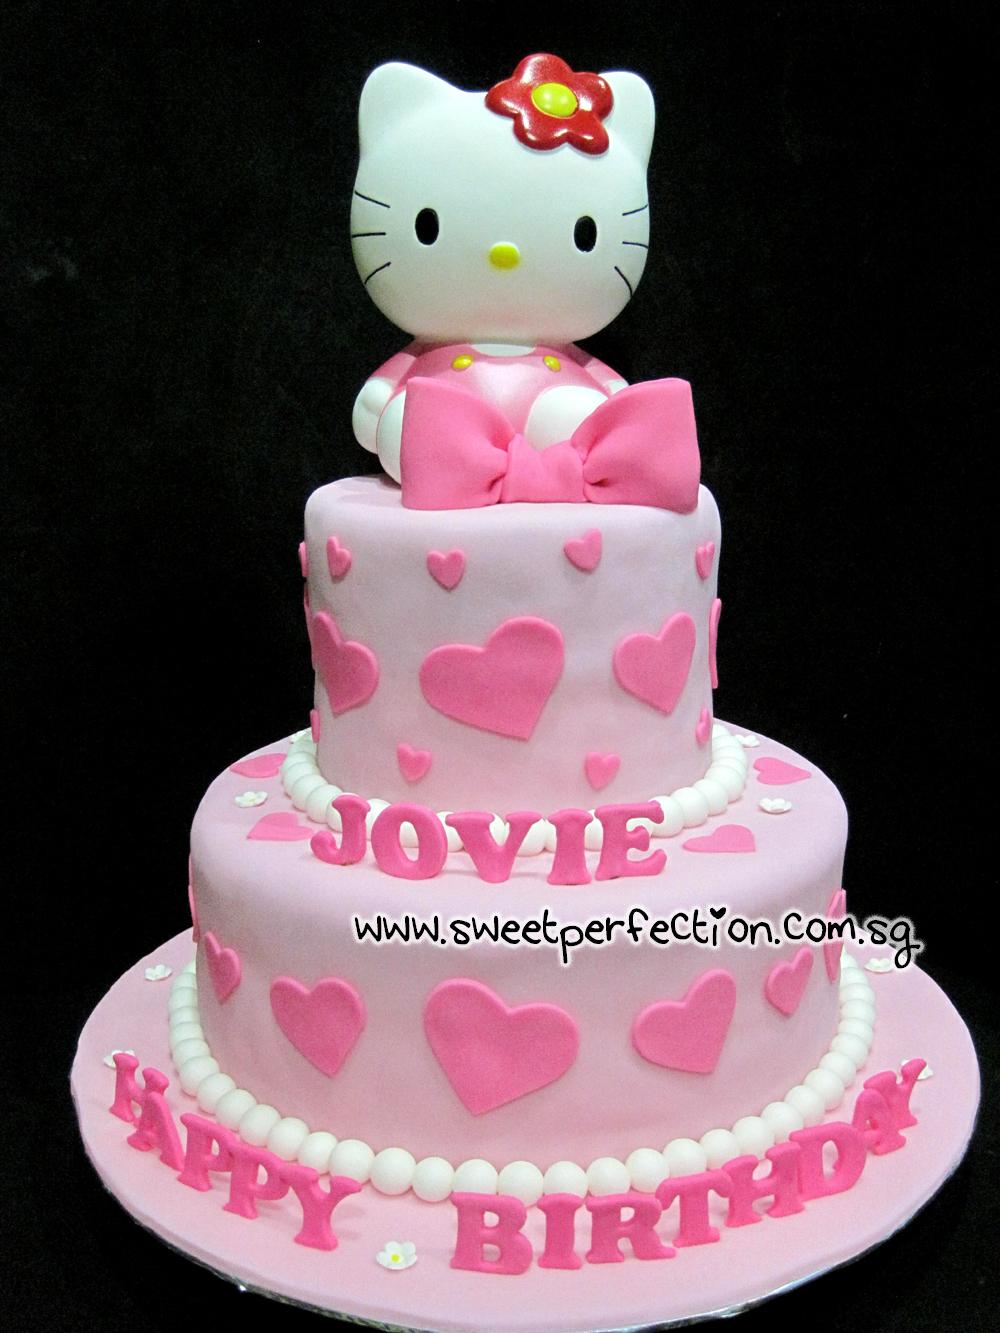 ... Cakes Gallery: Code HK33 - Hello Kitty & Jovie Birthday Cake